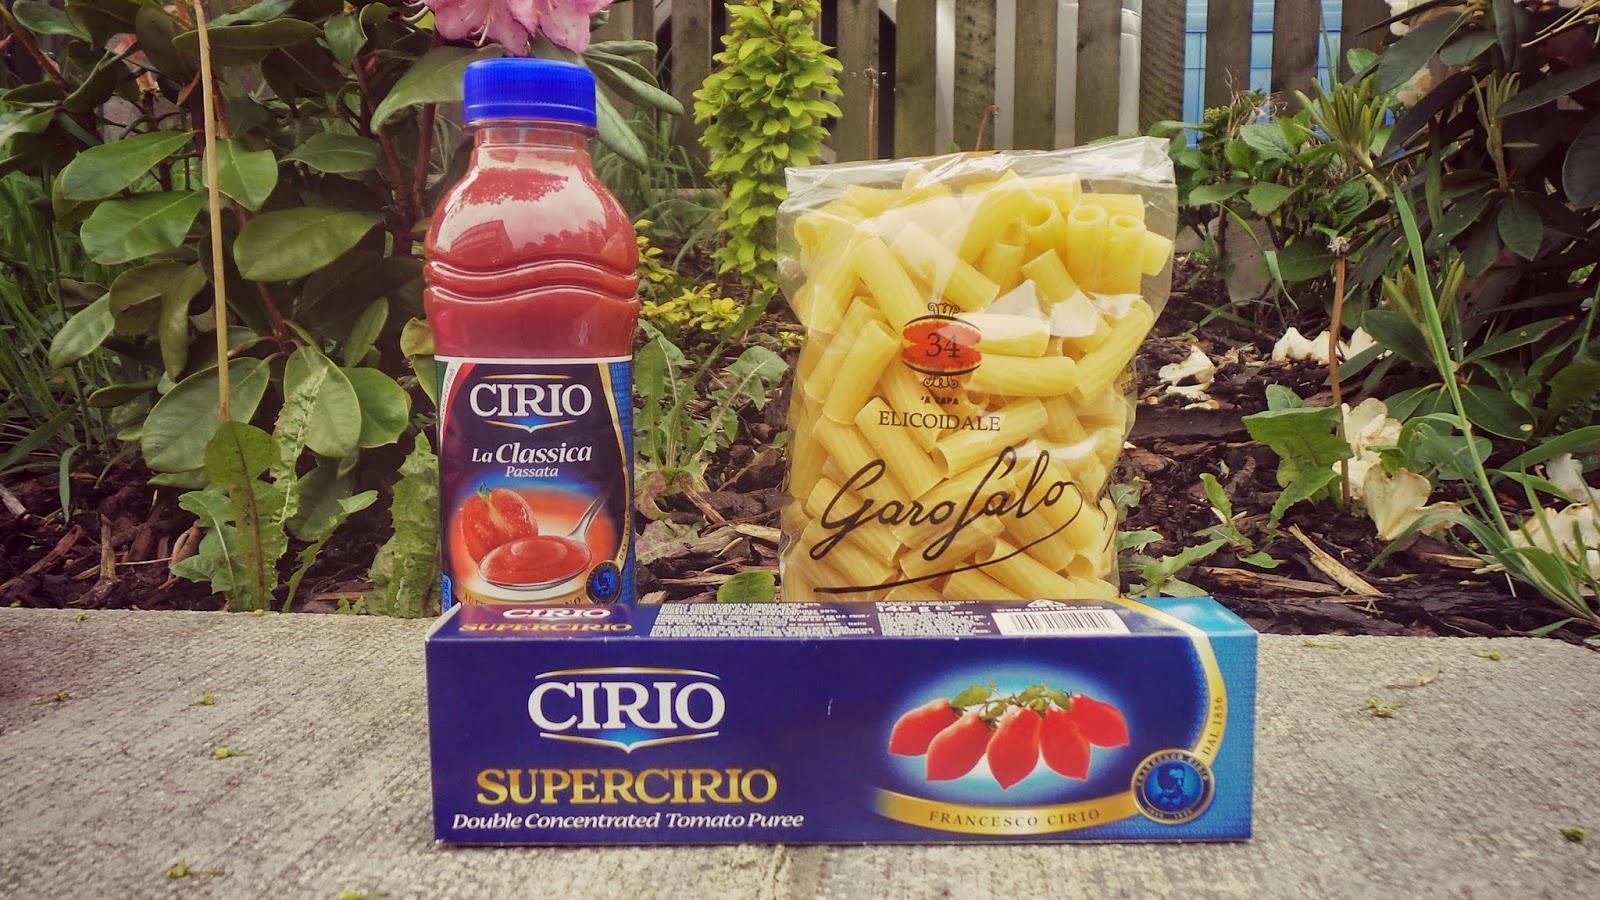 Cirio tomatoes in food subscription box